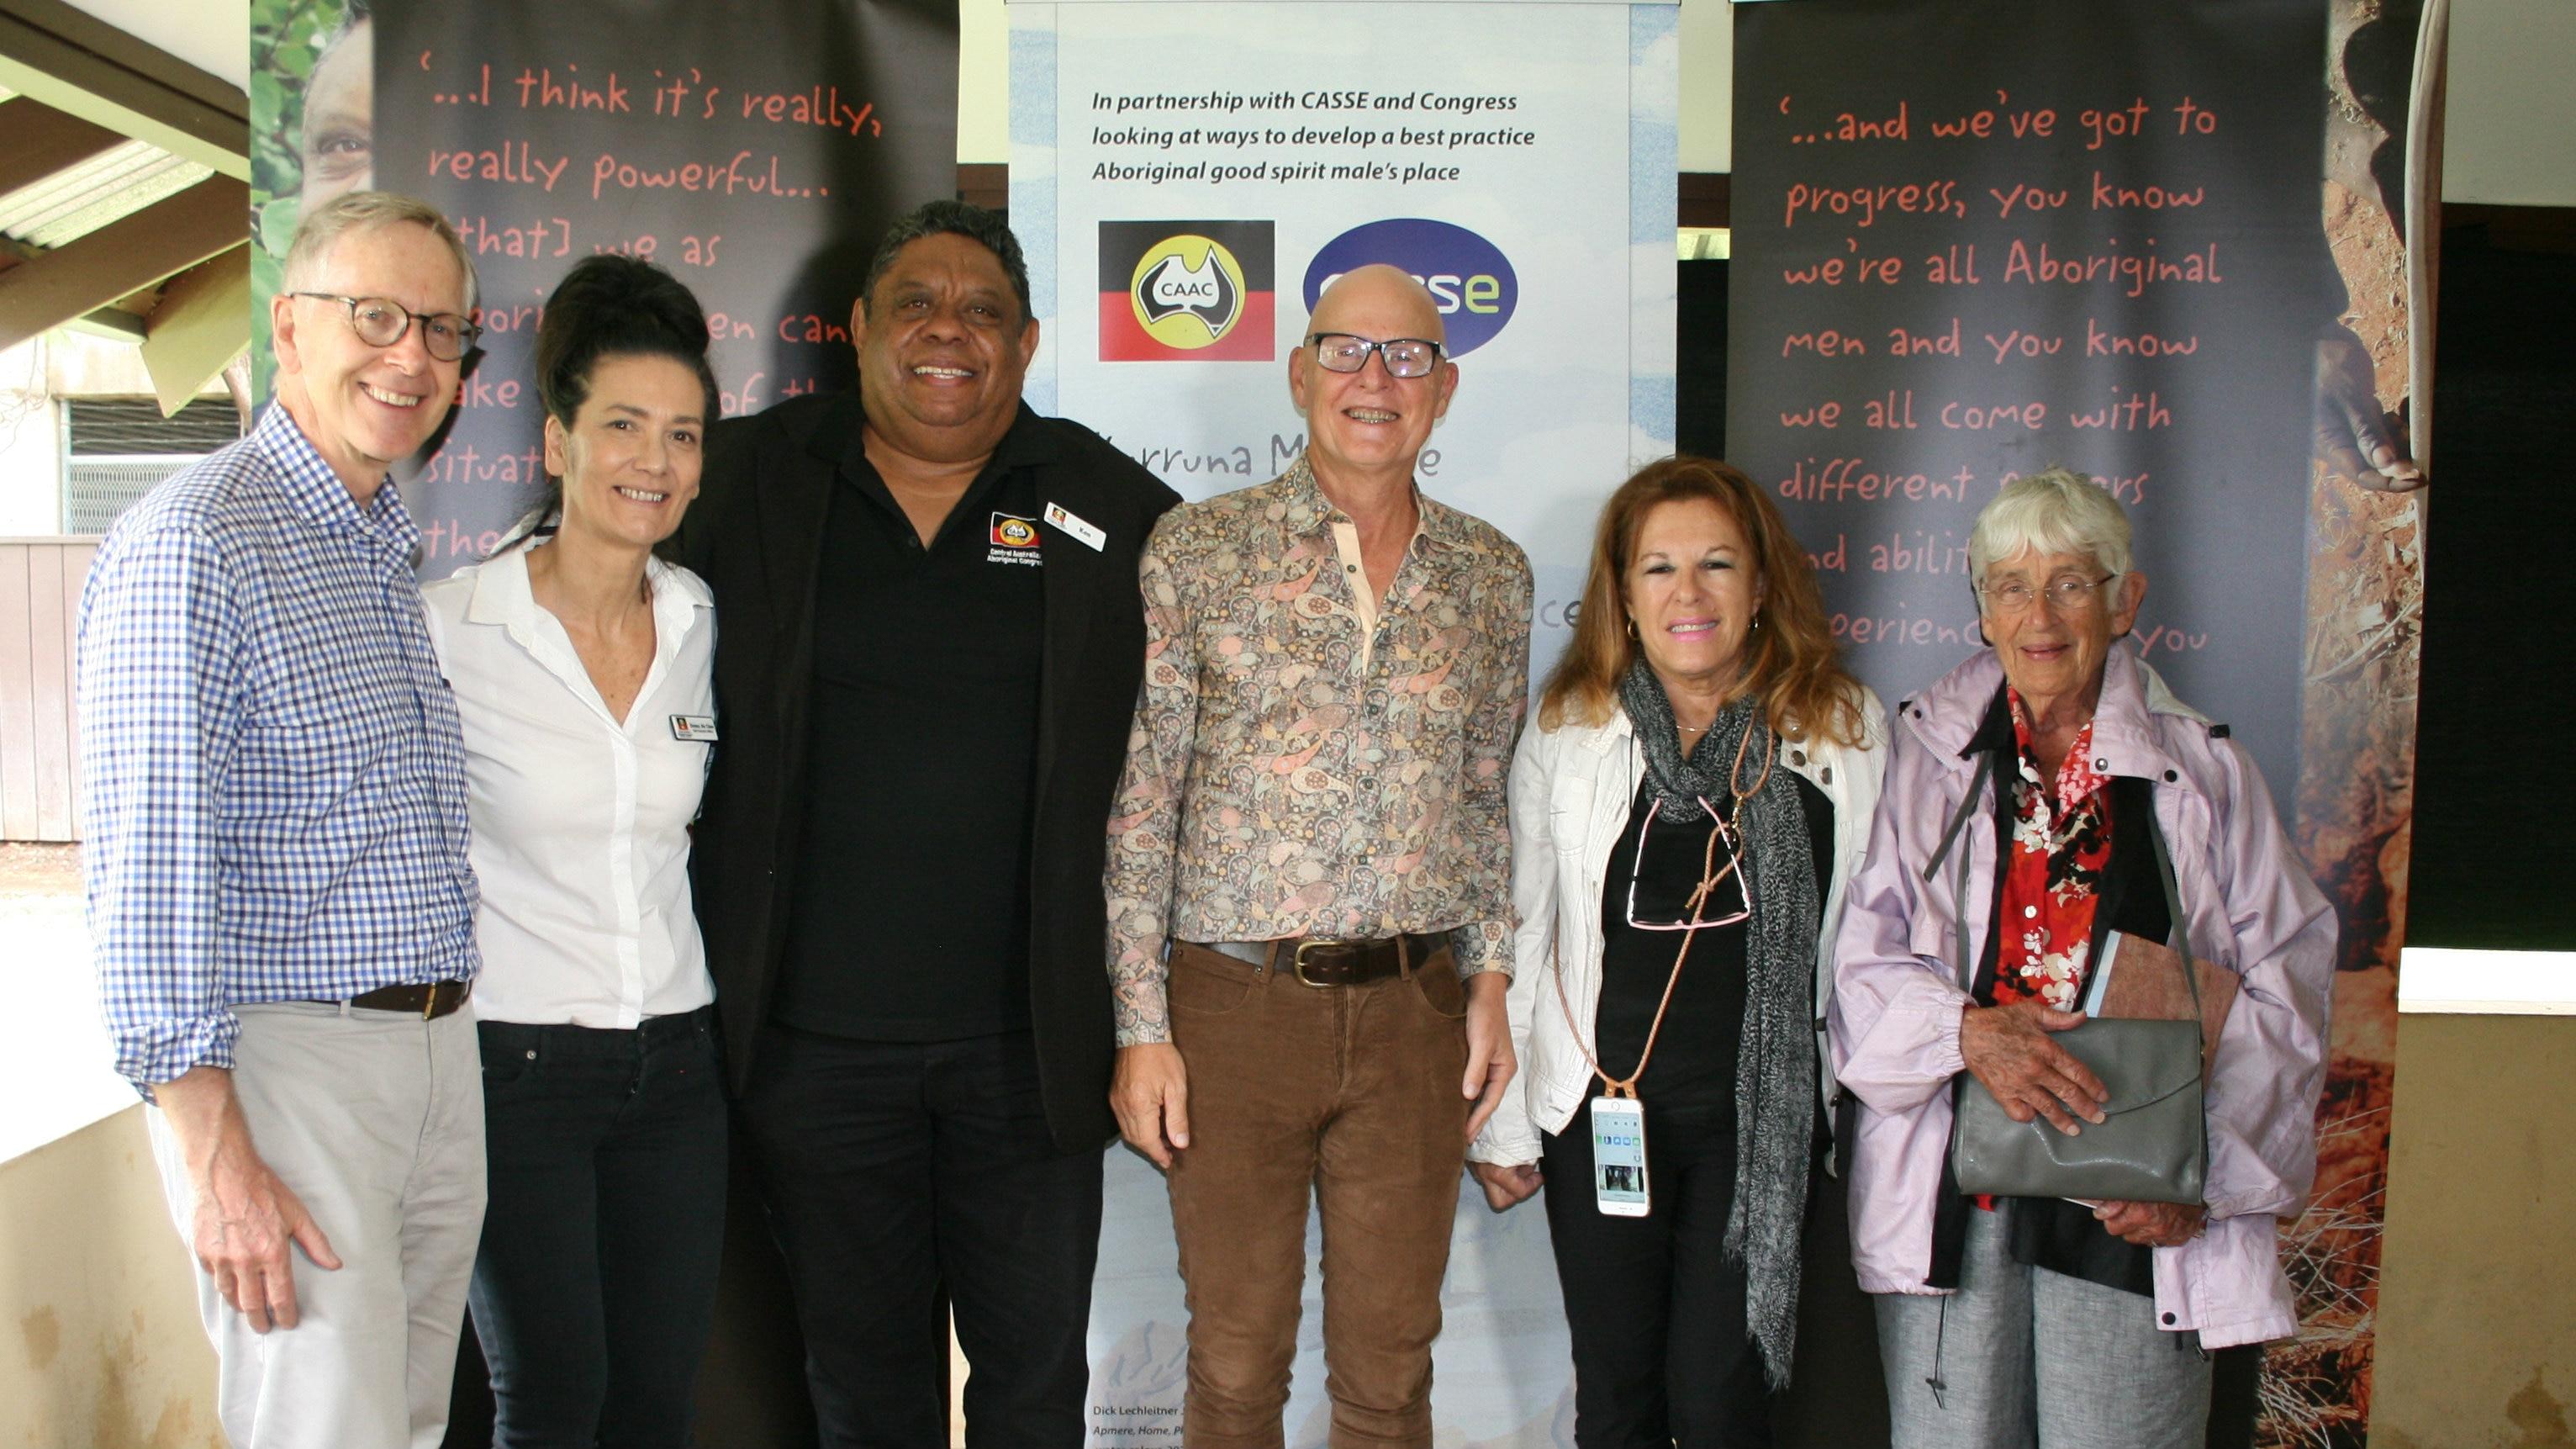 From left to right: Robert Springall (CASSE); Pamela Nathan (CASSE); Ken Lechleitner; Dr John Boffa (CAAC); Donna Ah Chee (CAAC) Anne Kantor AO (CAAC) (CASSE)